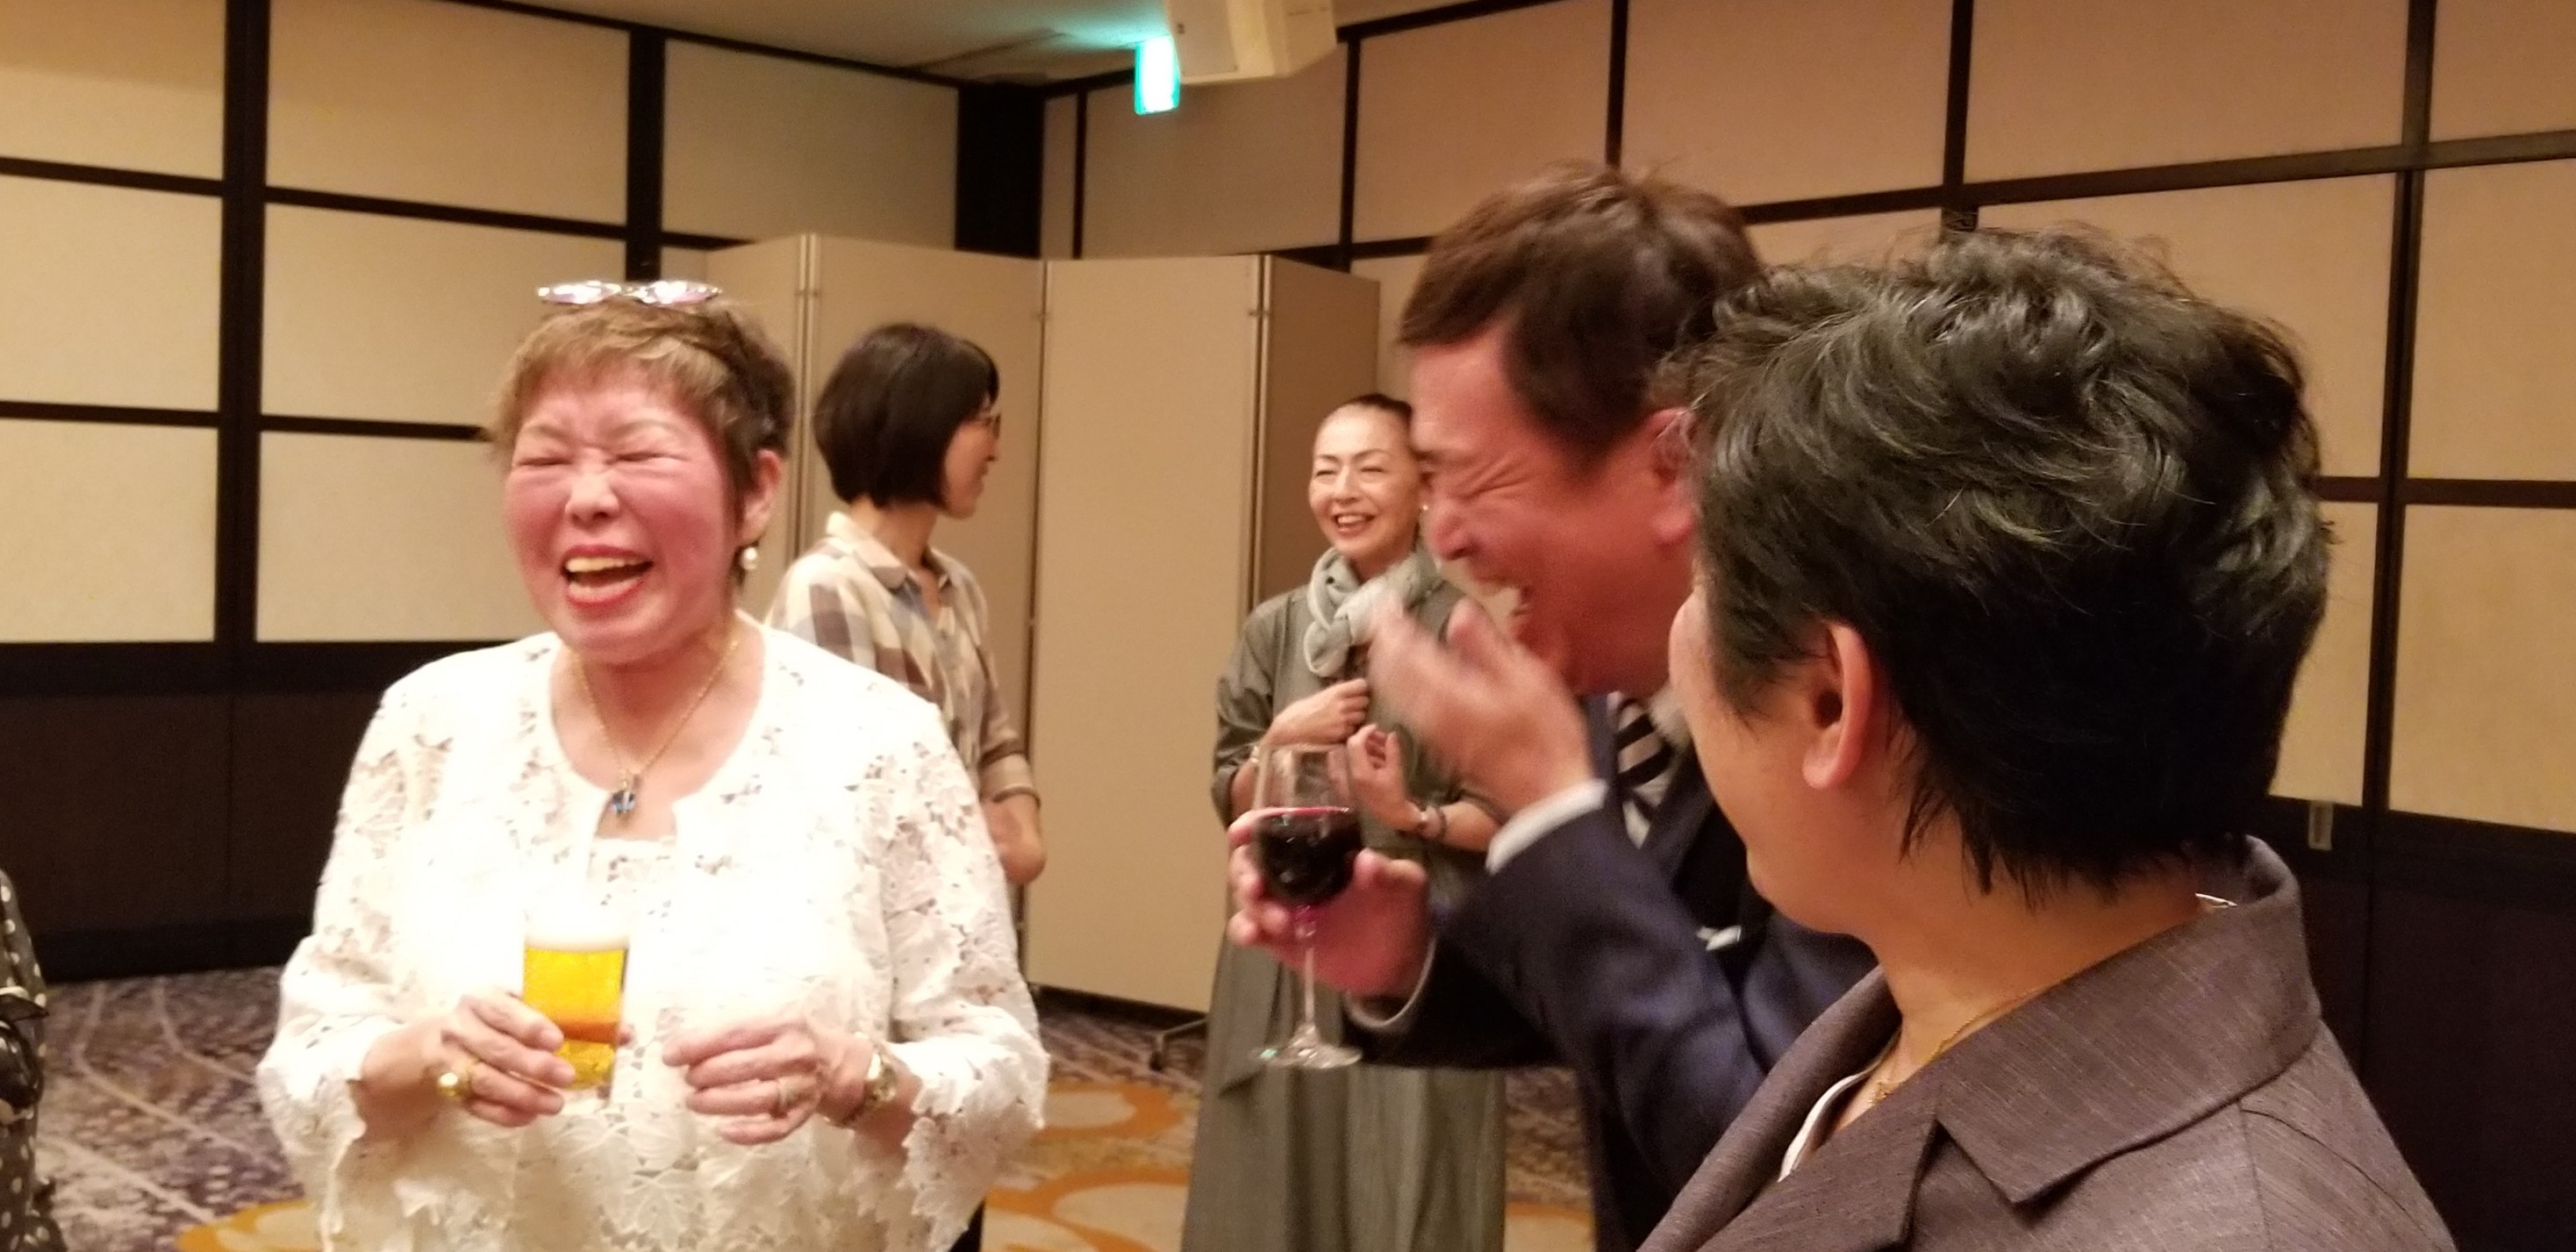 c0c6ee08224921f9f2ae33e42bf09ad2 - 第6回思風会全国大会2018in東京開催